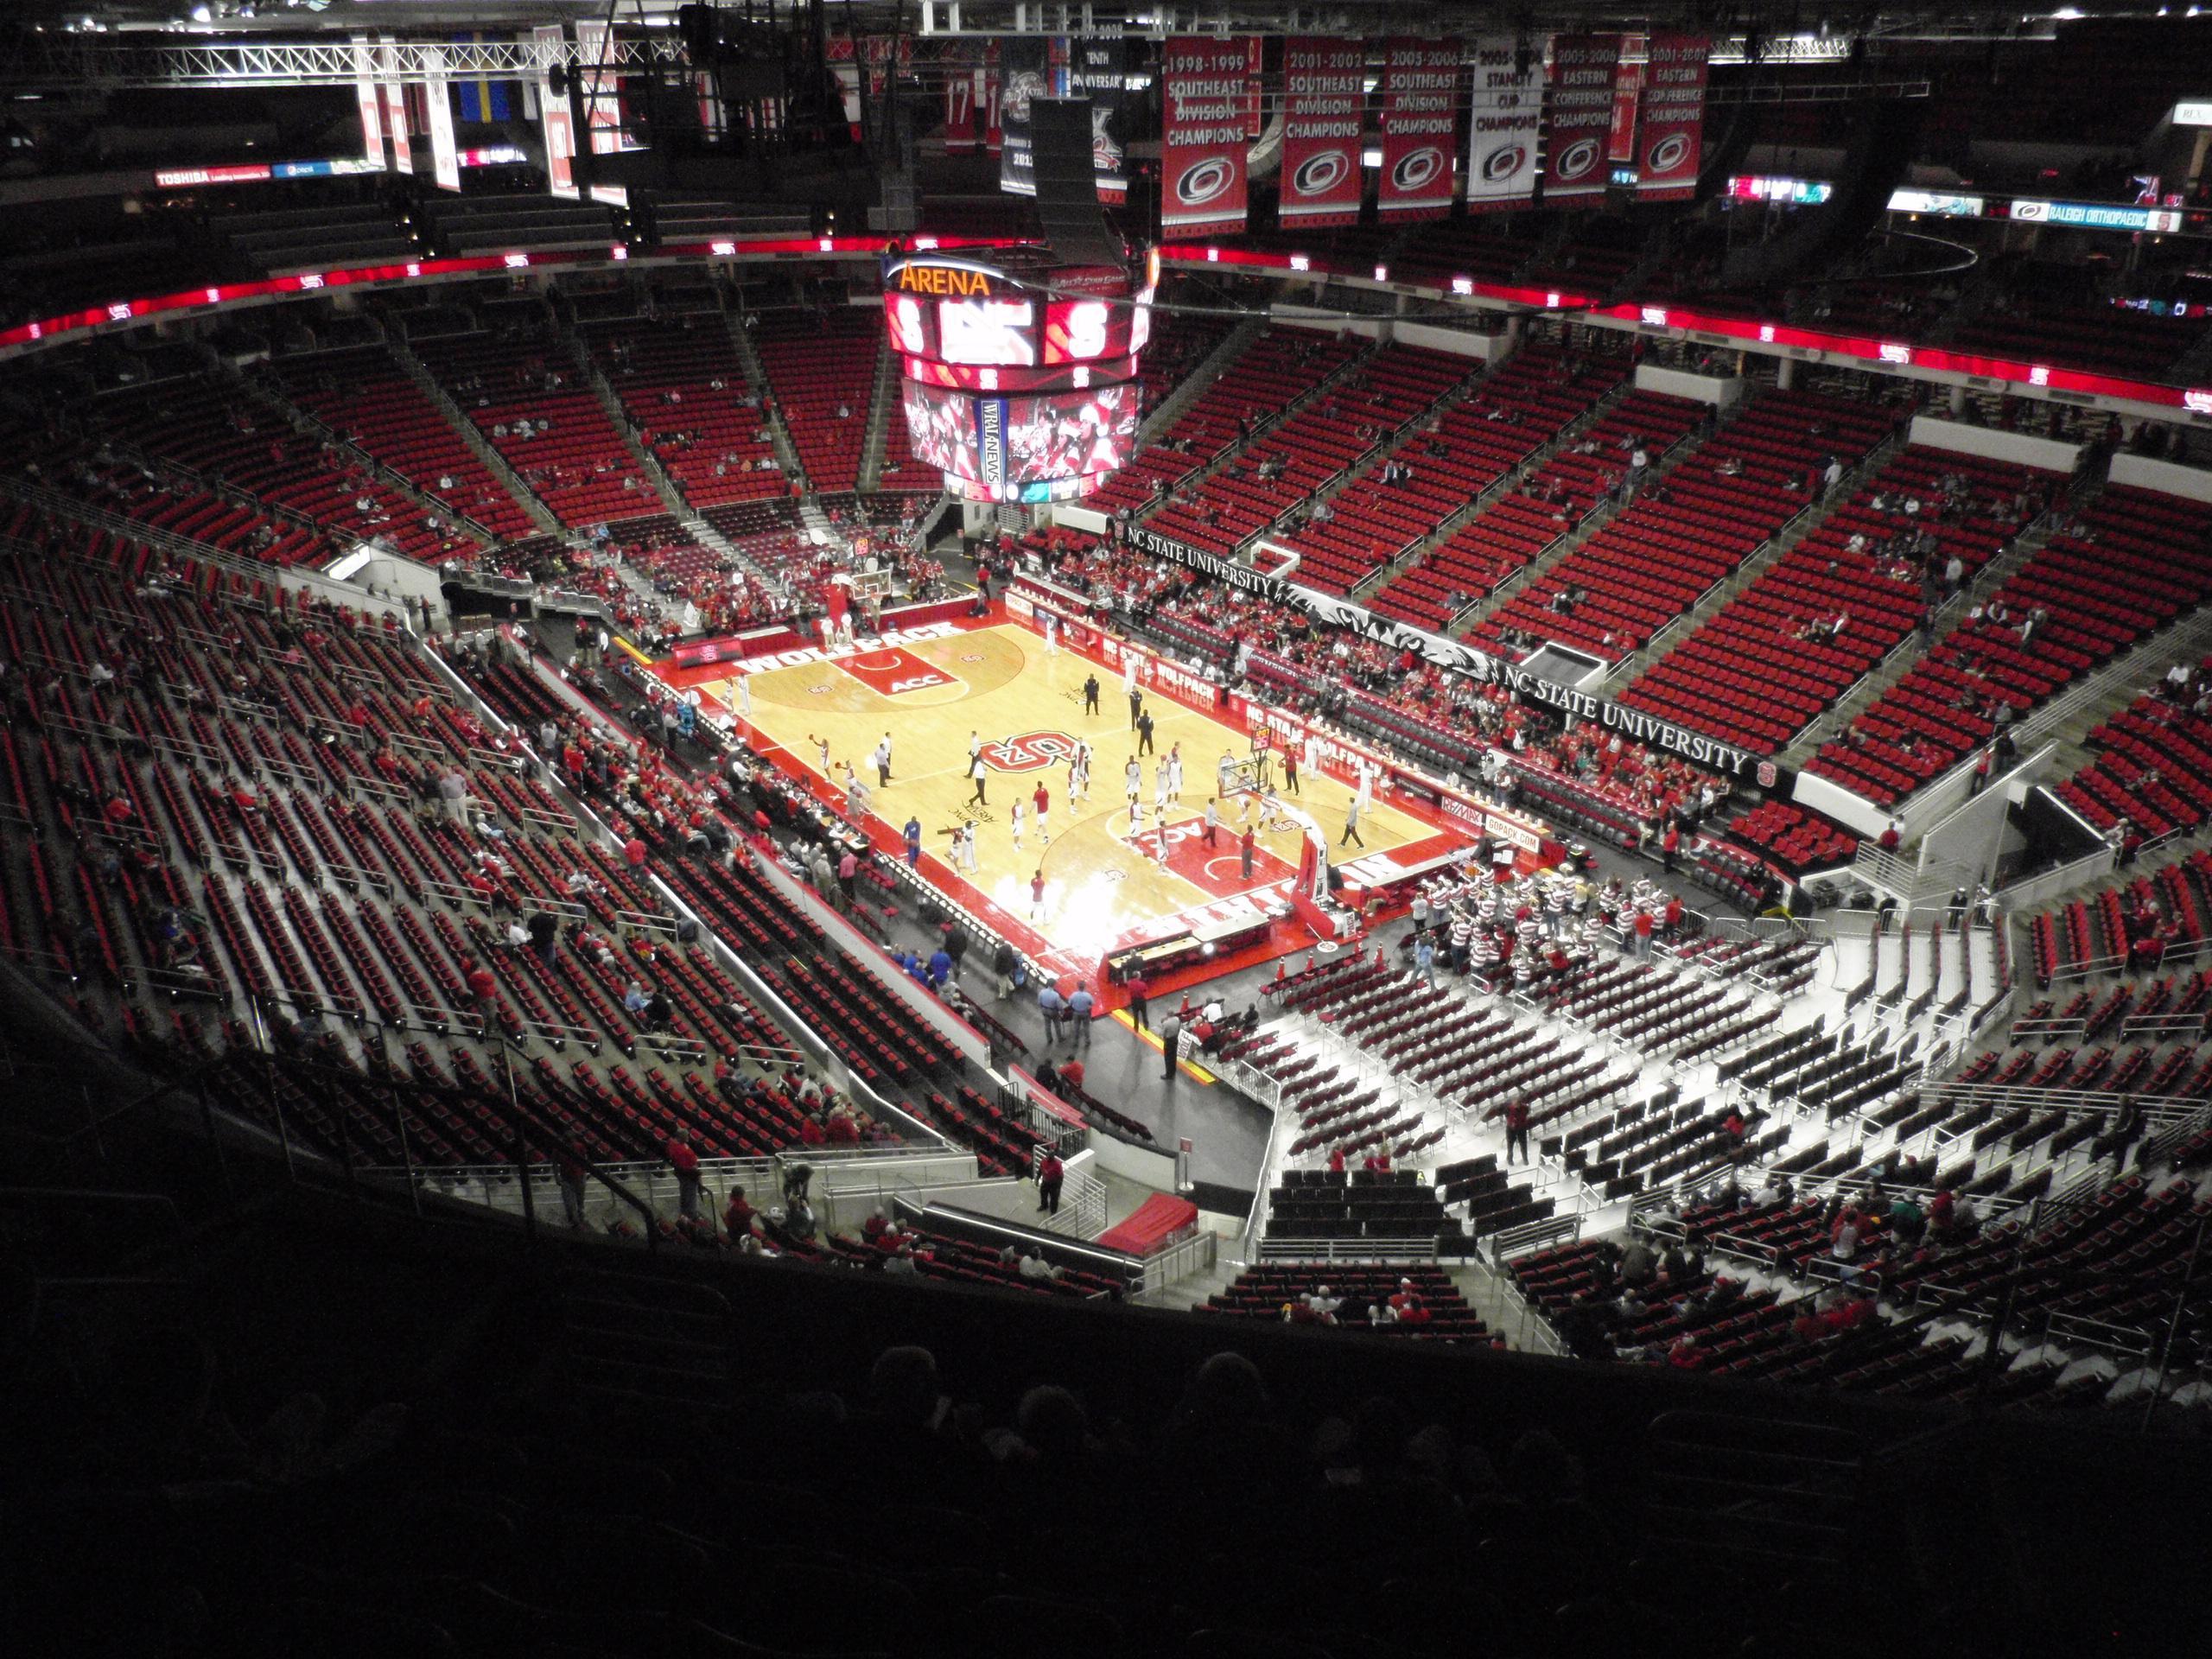 Pnc Arena Section 318 Nc State Basketball